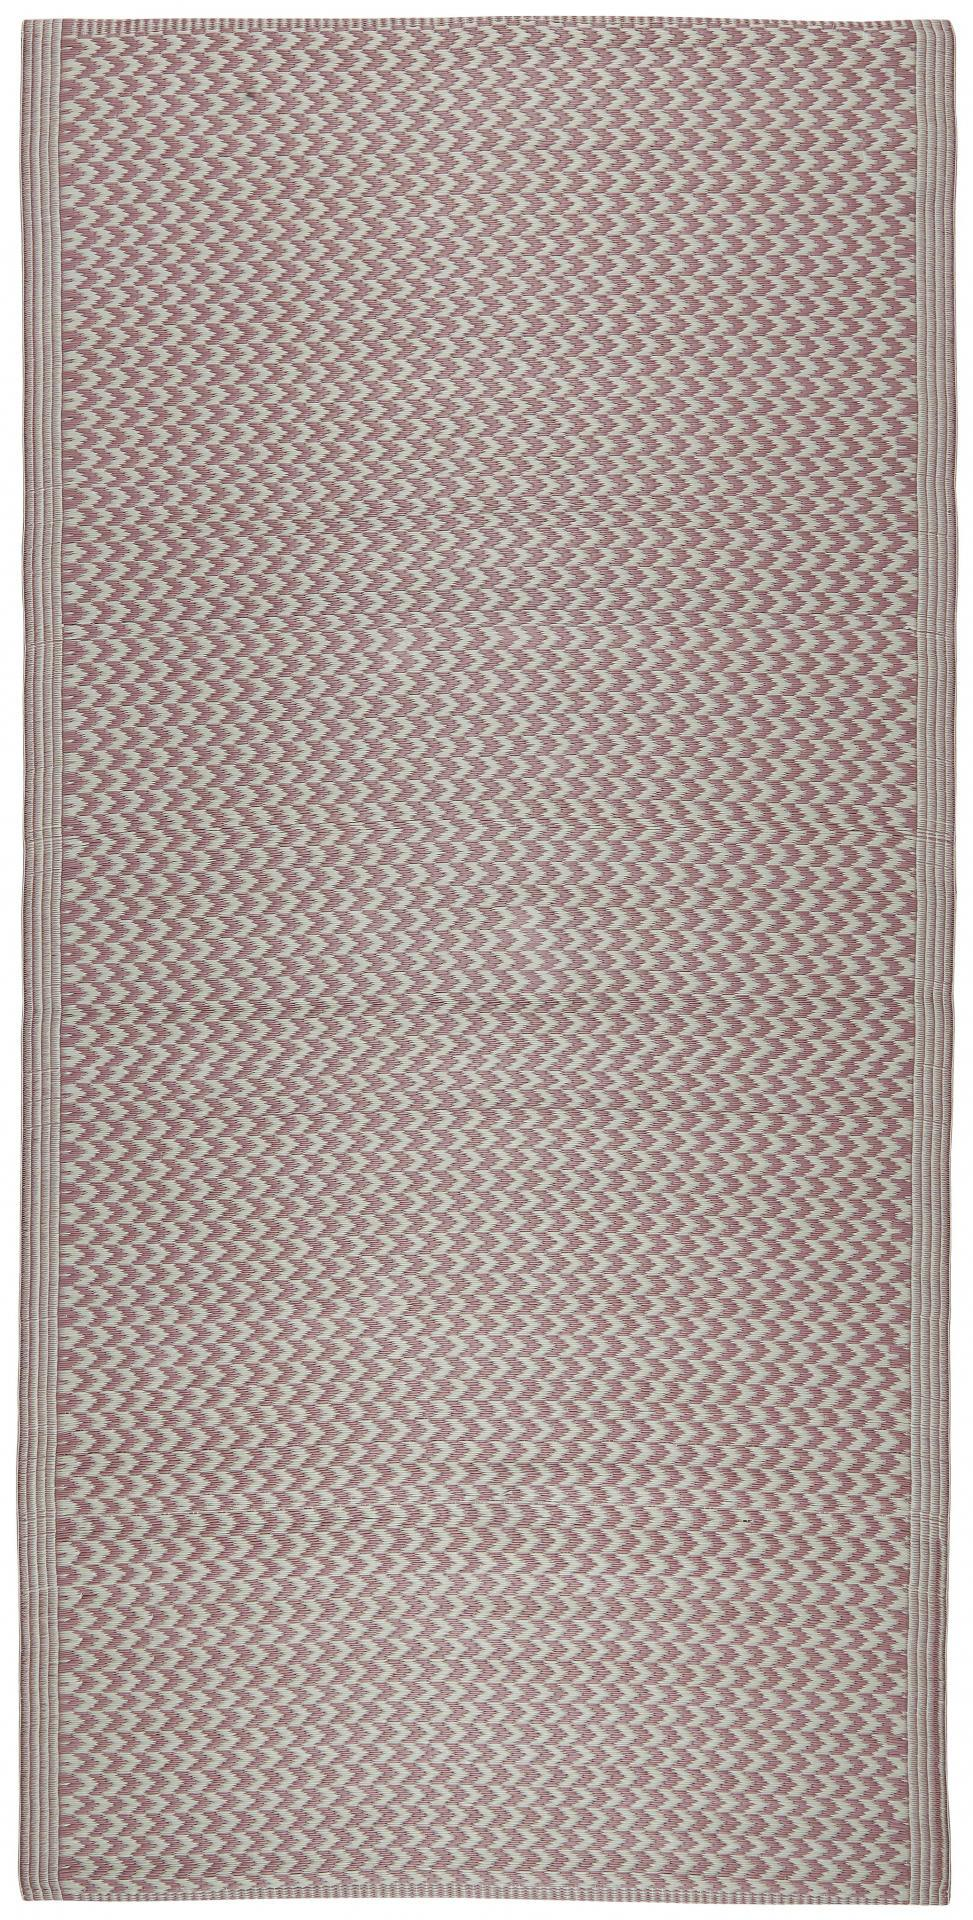 IB LAURSEN Plastový koberec Recycled Pink 90x180 cm, růžová barva, bílá barva, plast